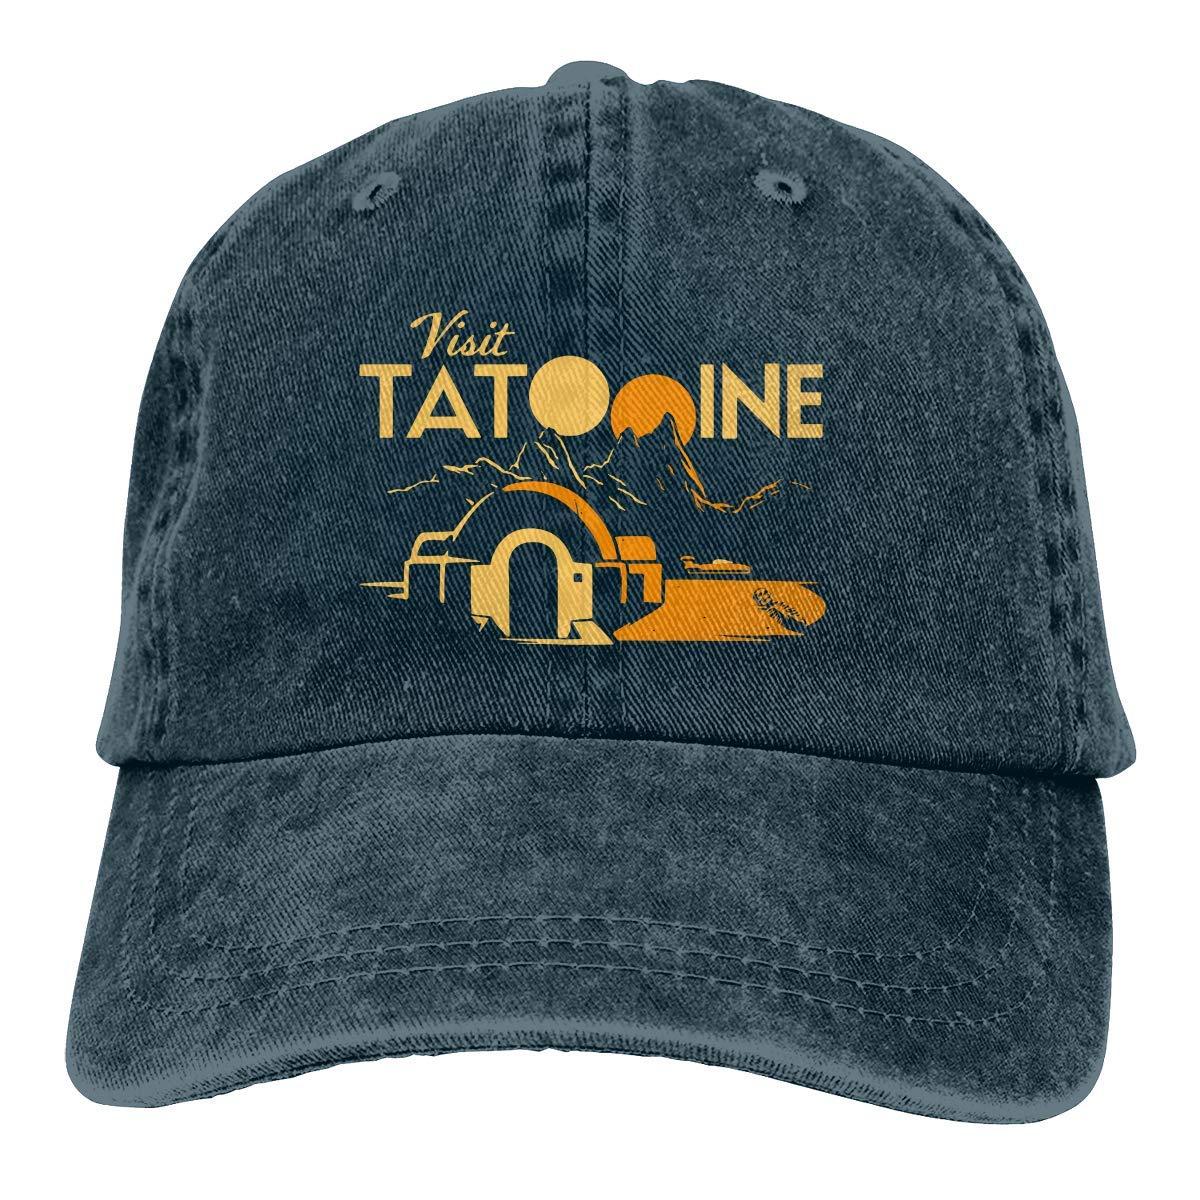 Visit Tatooine Unisex Baseball Hat Cowboy Cap Sun Hats Trucker Hats